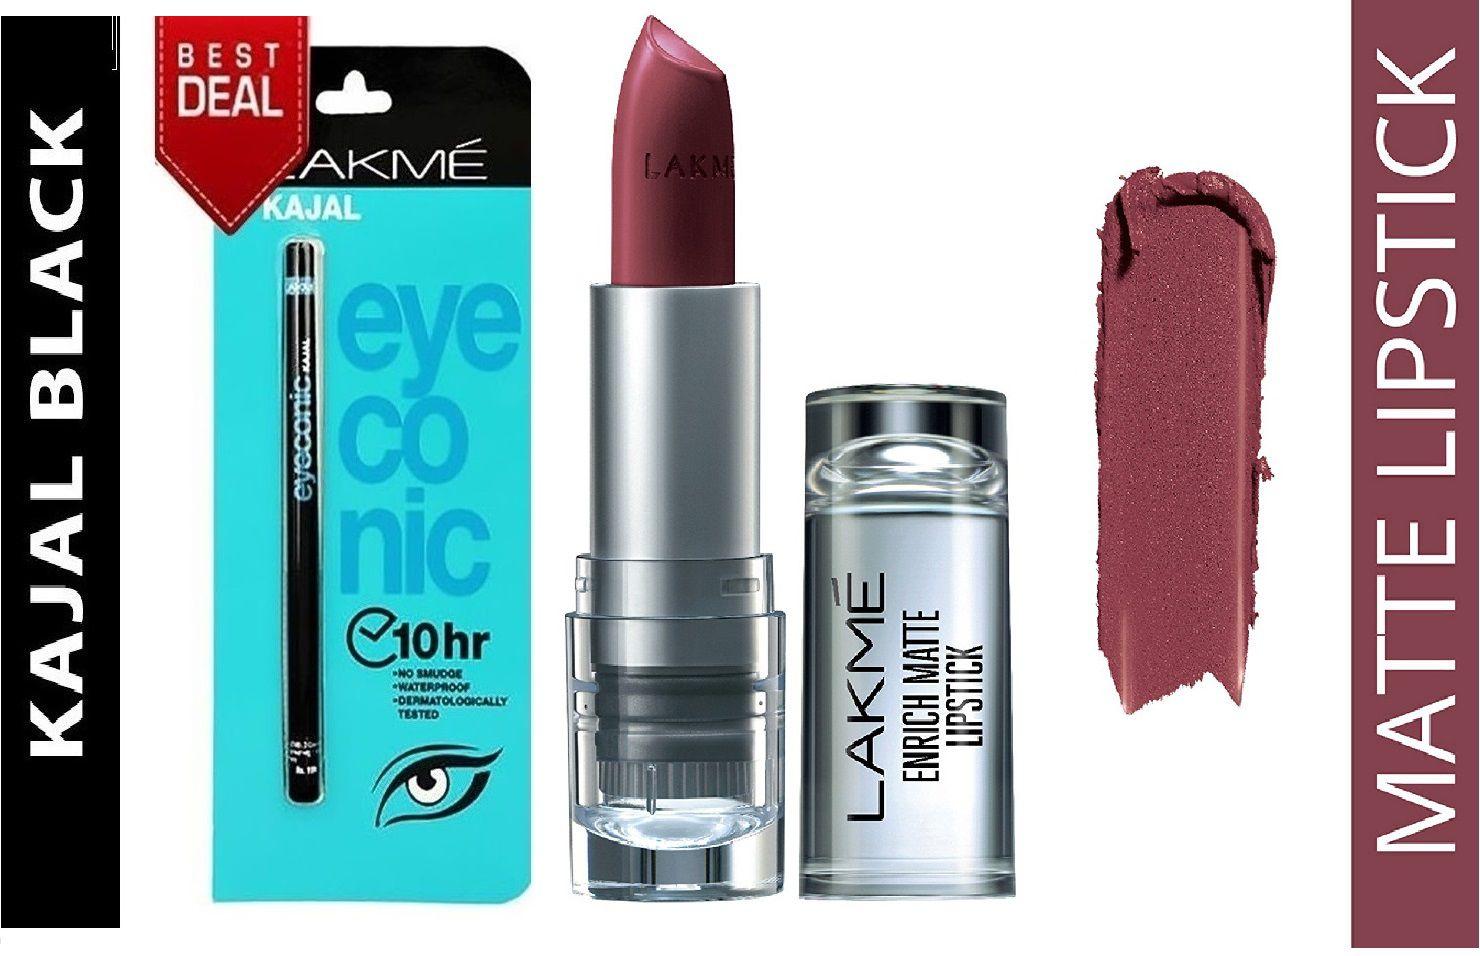 fd1cca71d7 Lakme Enrich Matte Lipstick & Eyeconic Kajal Combo Shade RM10 Face gm Pack  of 2: Buy Lakme Enrich Matte Lipstick & Eyeconic Kajal Combo Shade RM10  Face gm ...